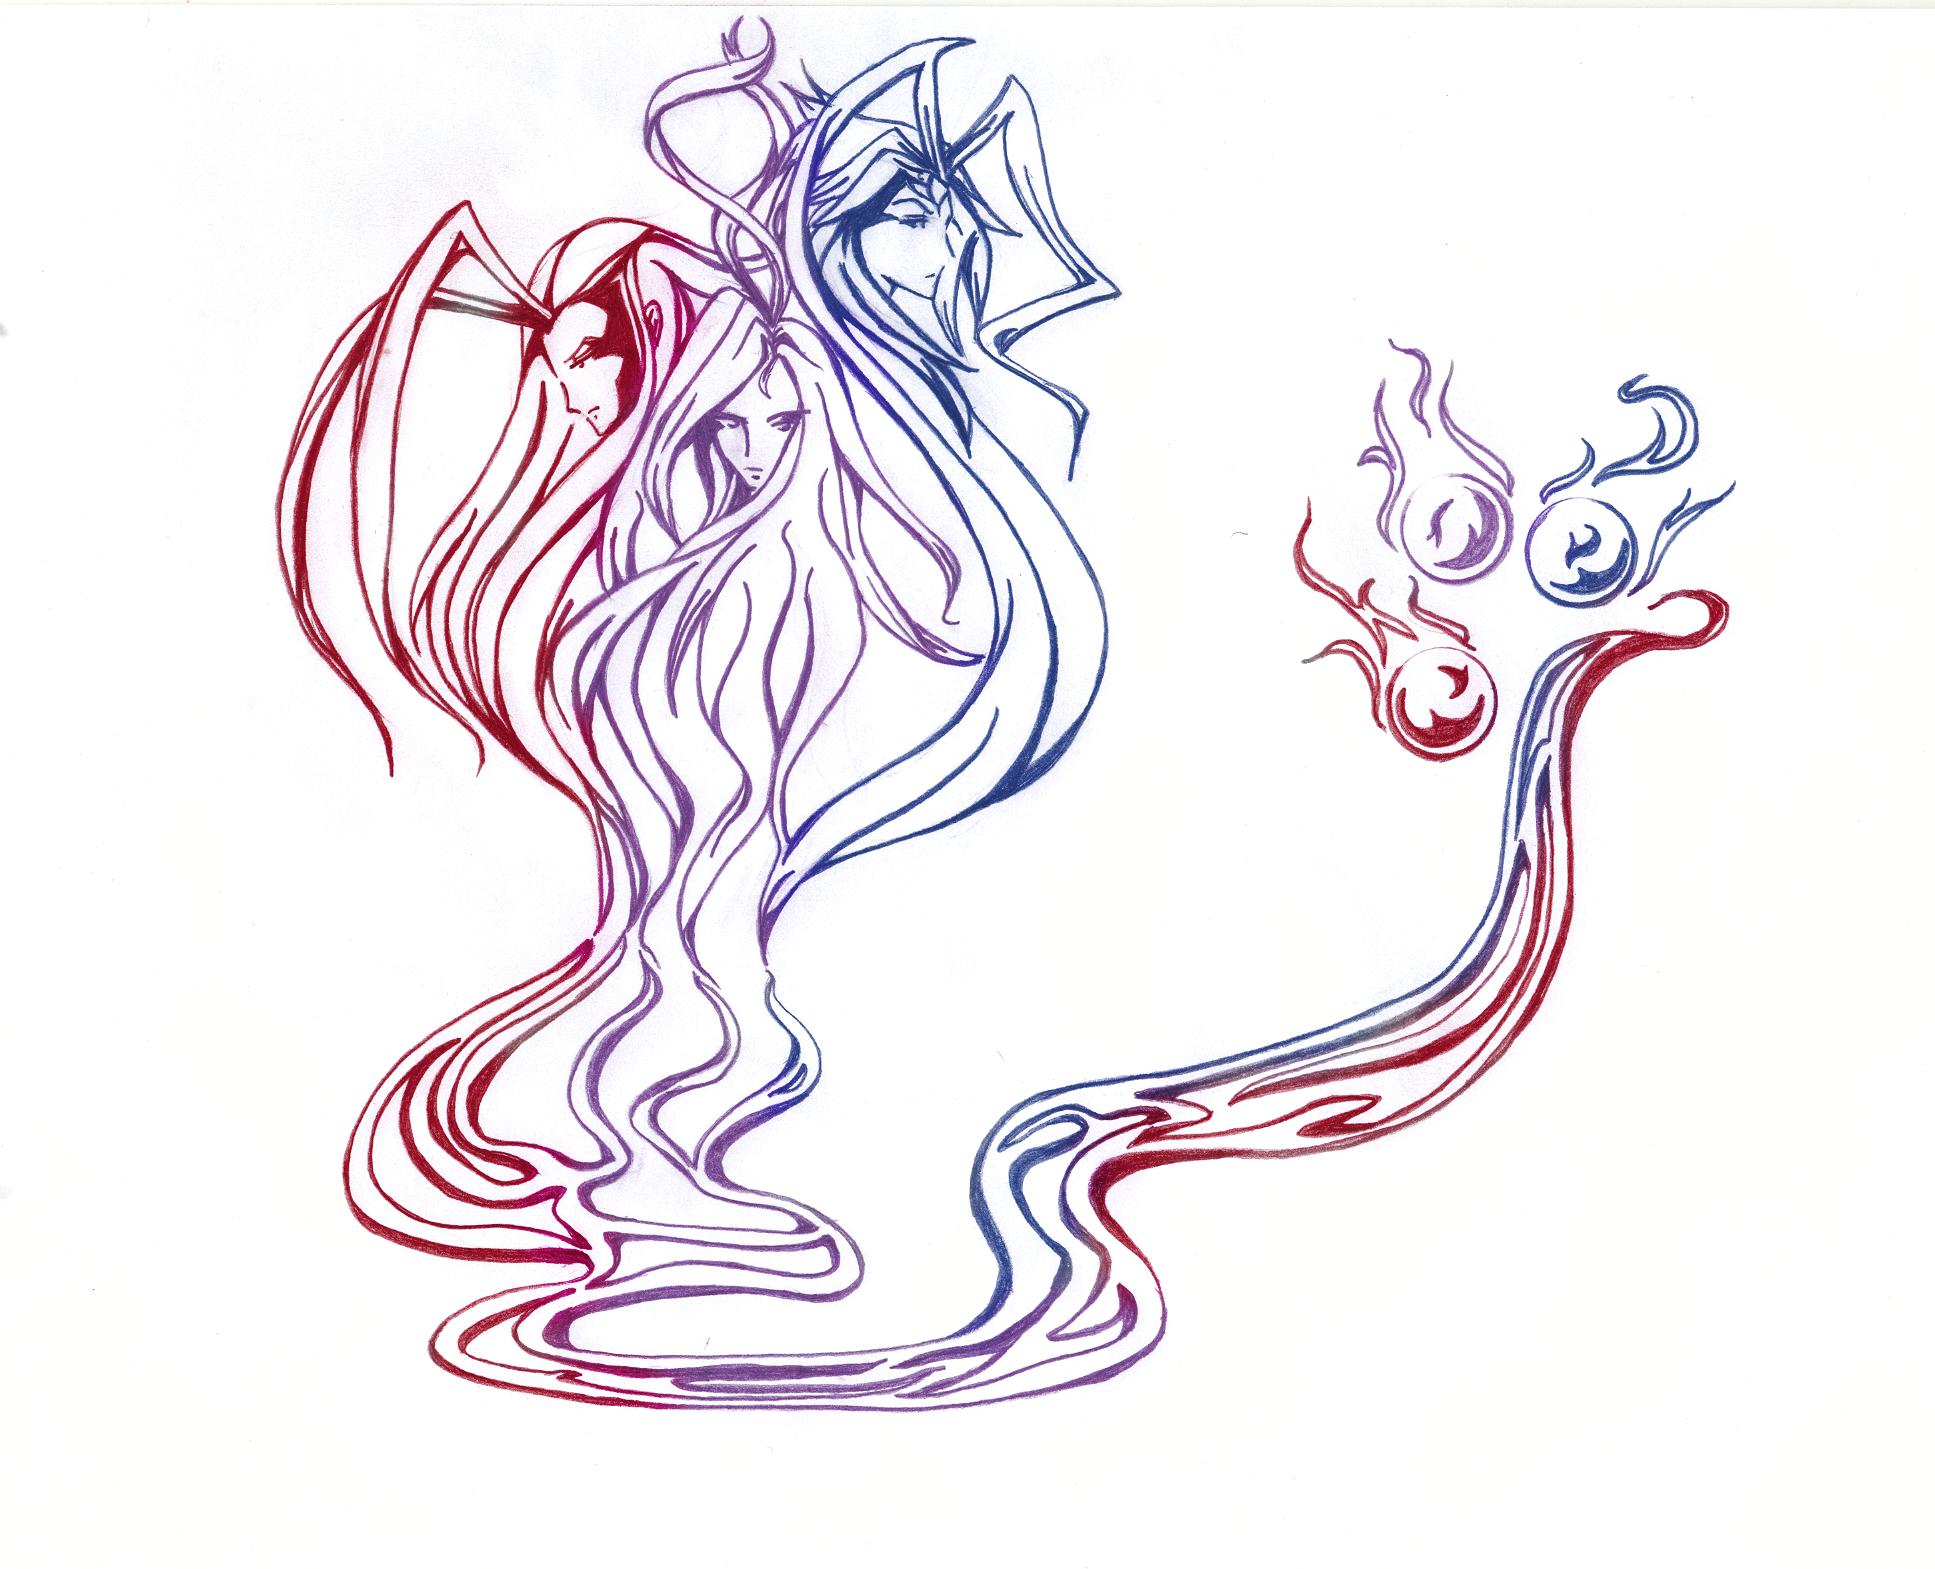 Final fantasy logo art - photo#15